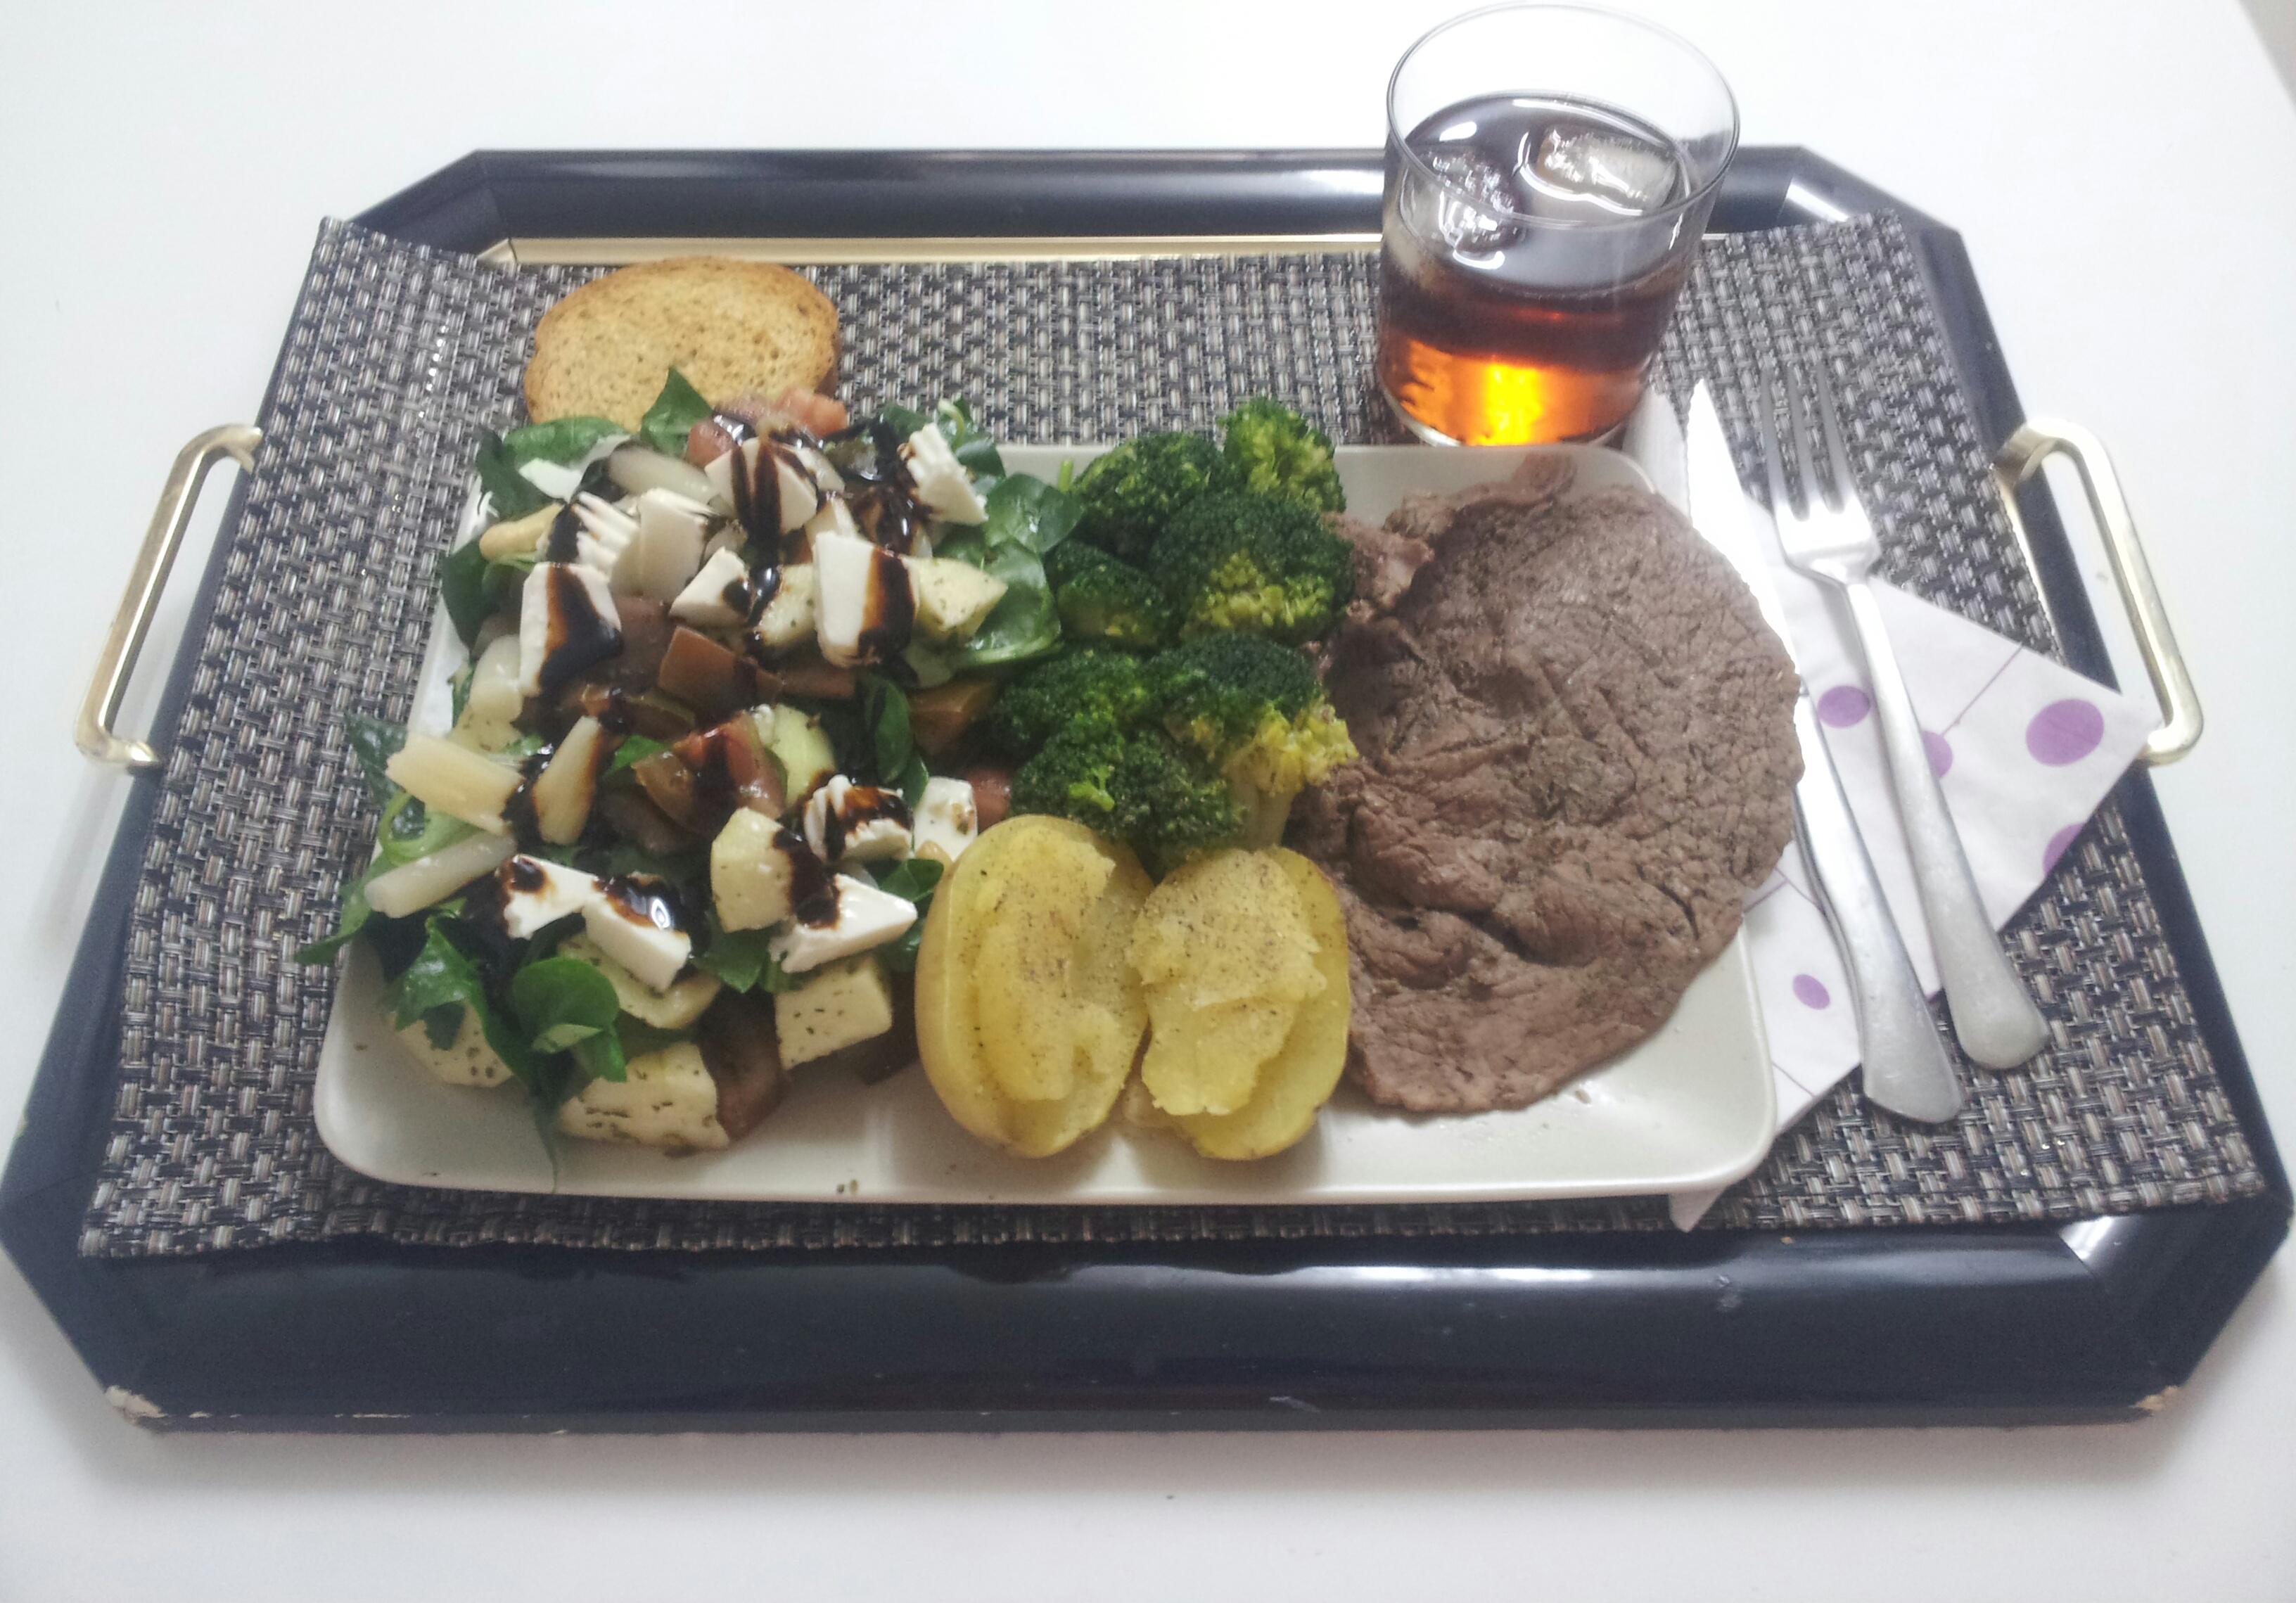 Recetas sanas, recetas saludables, recetas fitness, ensalada, ternera, brócoli, patata.